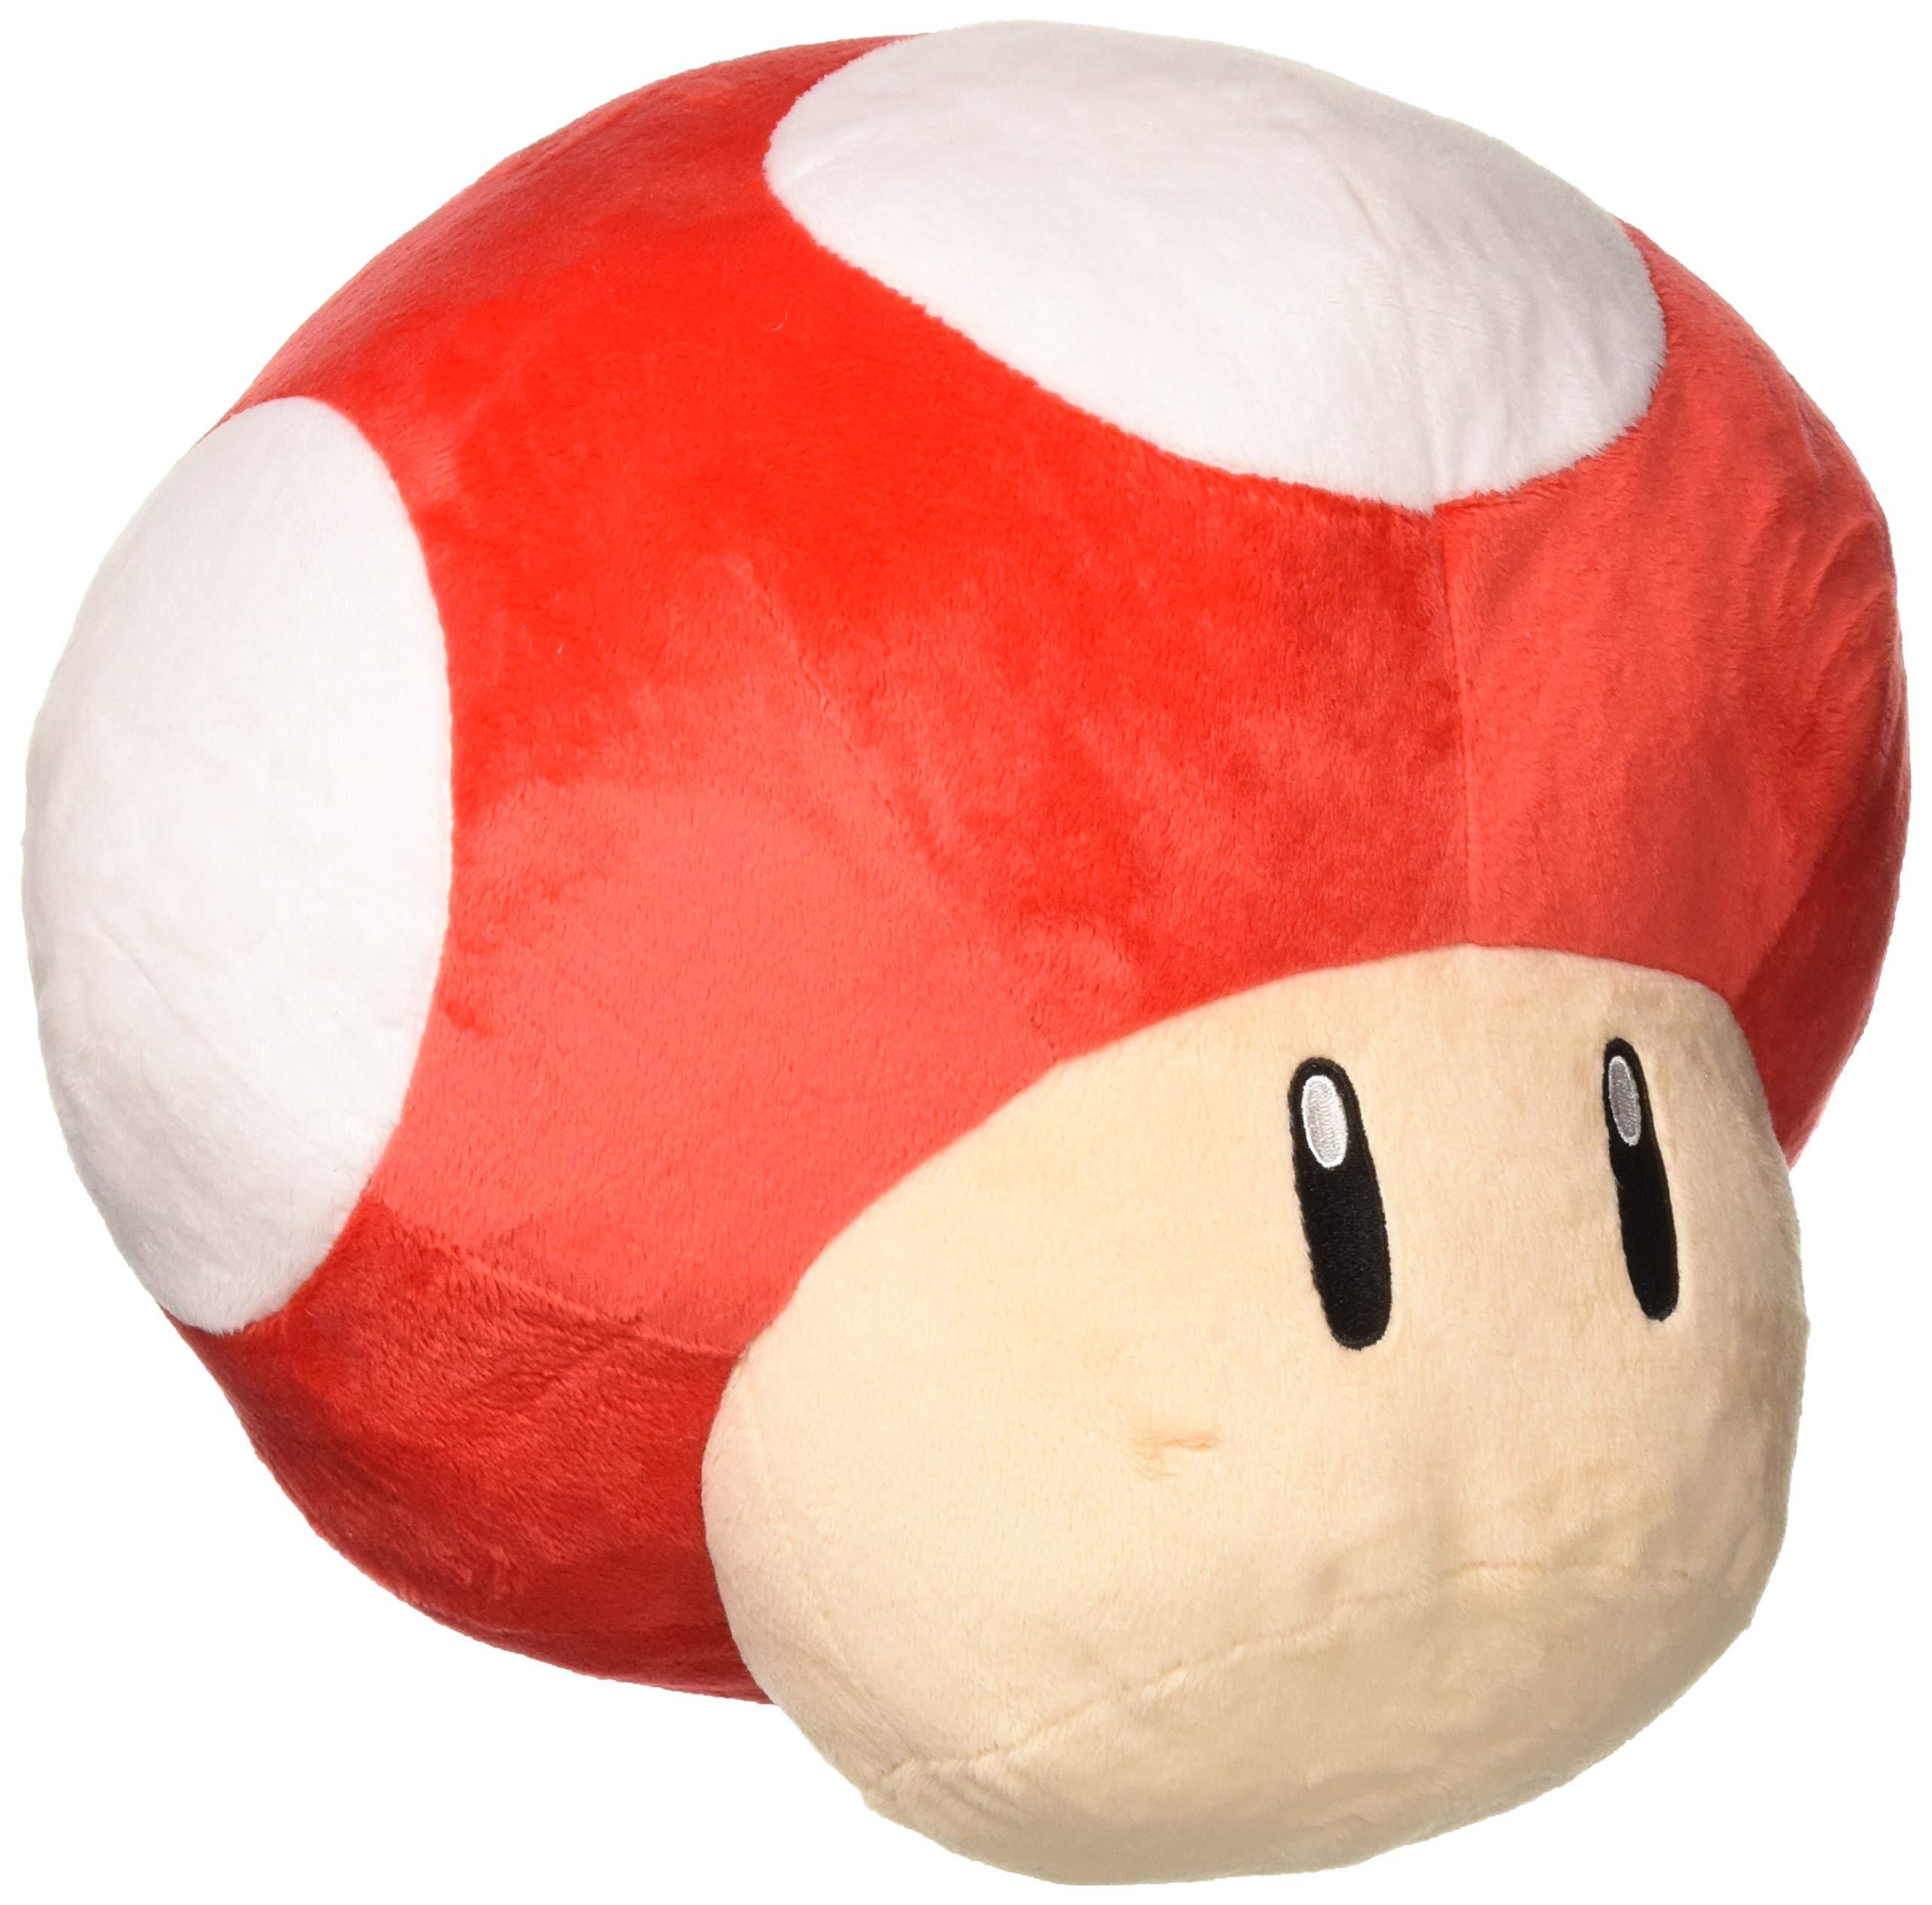 Little Buddy USA Super Mario Series 11'' Large Super Mushroom Pillow Plush